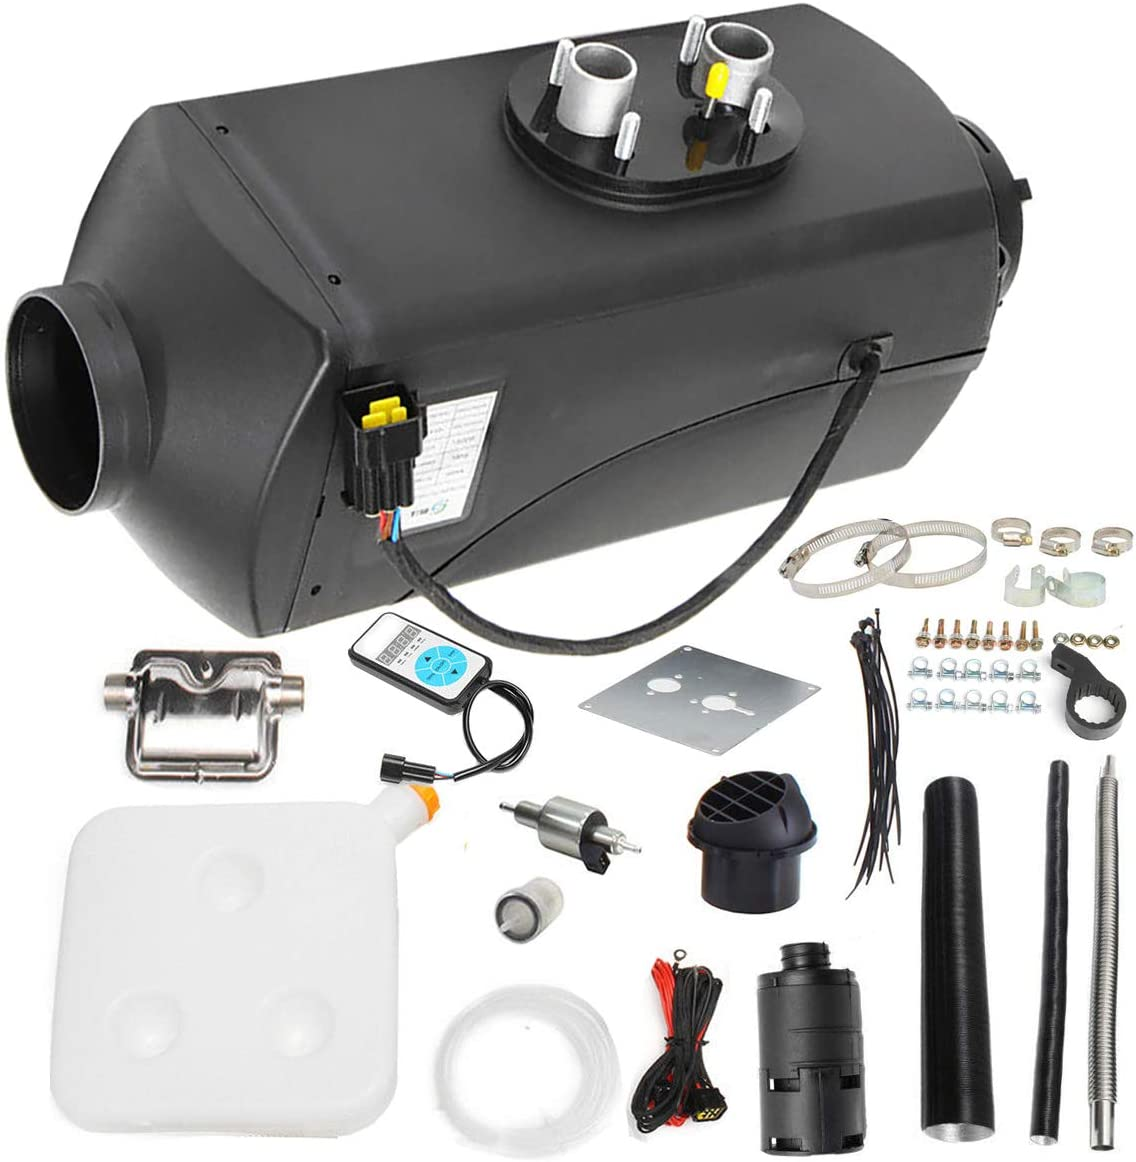 5KW Diesel Air Heater Thermostat PLANAR 5000W 12V for trucks motor boats bus car